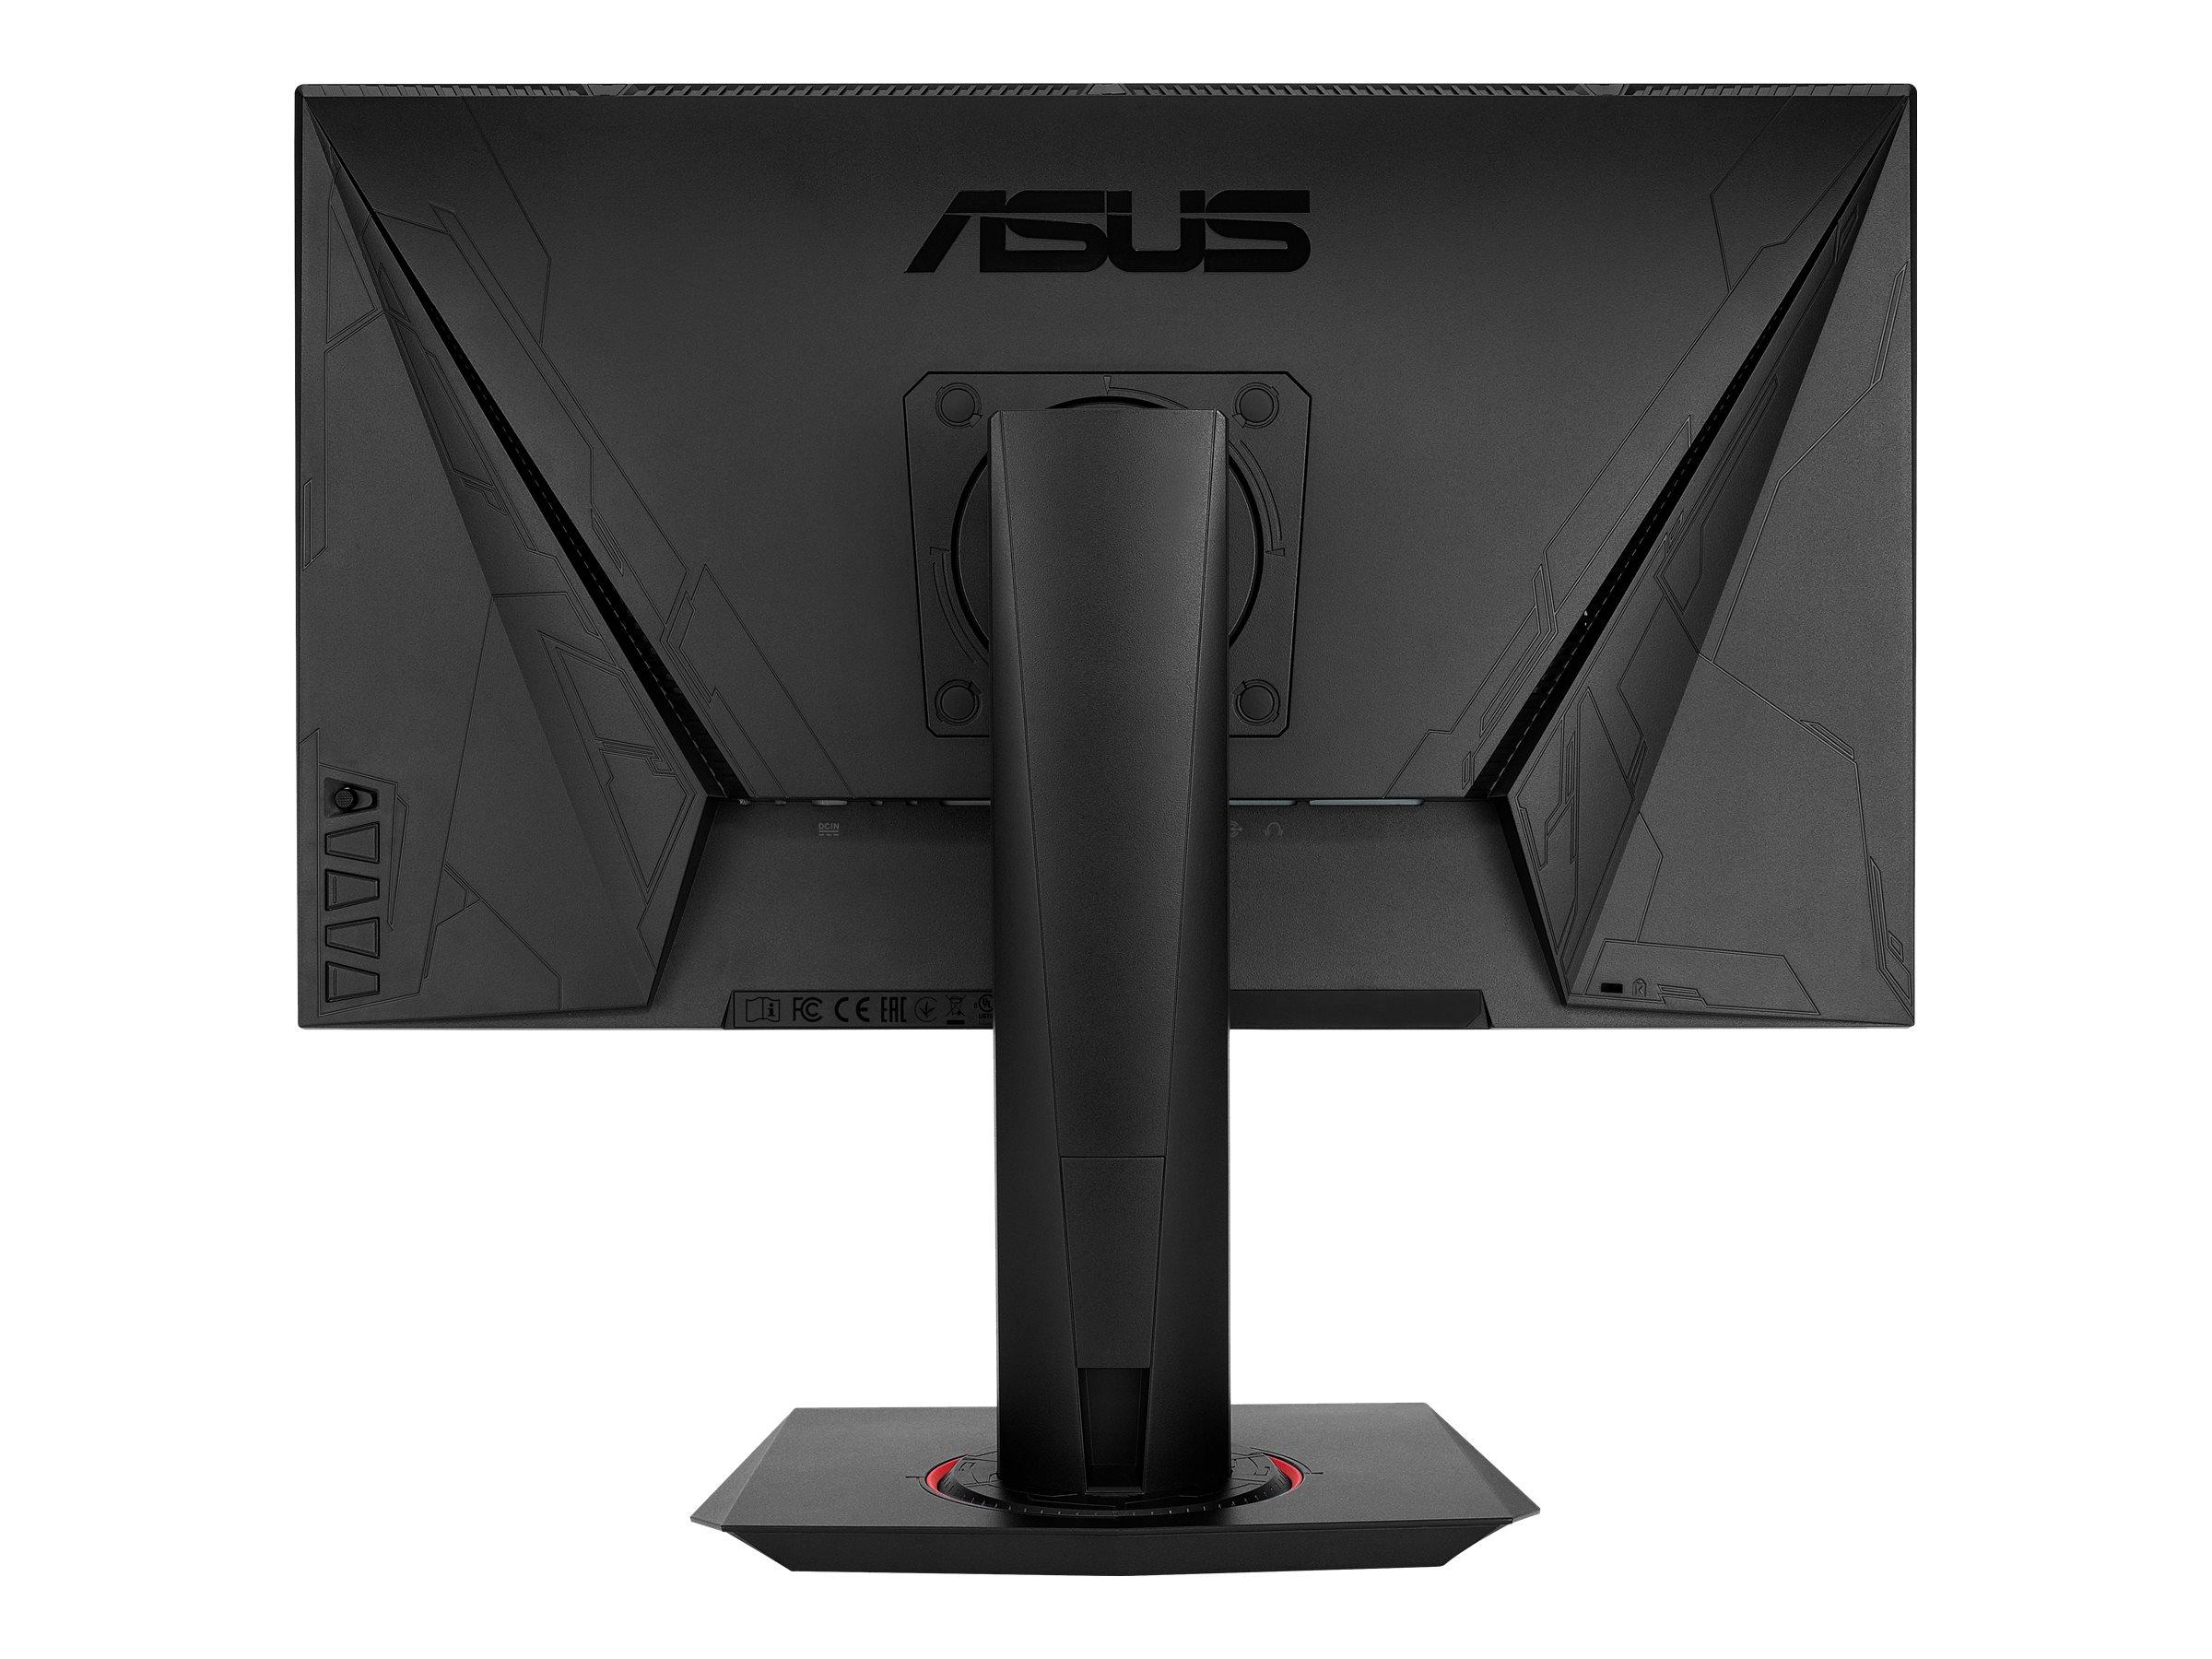 "ASUS VG248QG - LED-Monitor - 61 cm (24"") - 1920 x 1080 Full HD (1080p)"